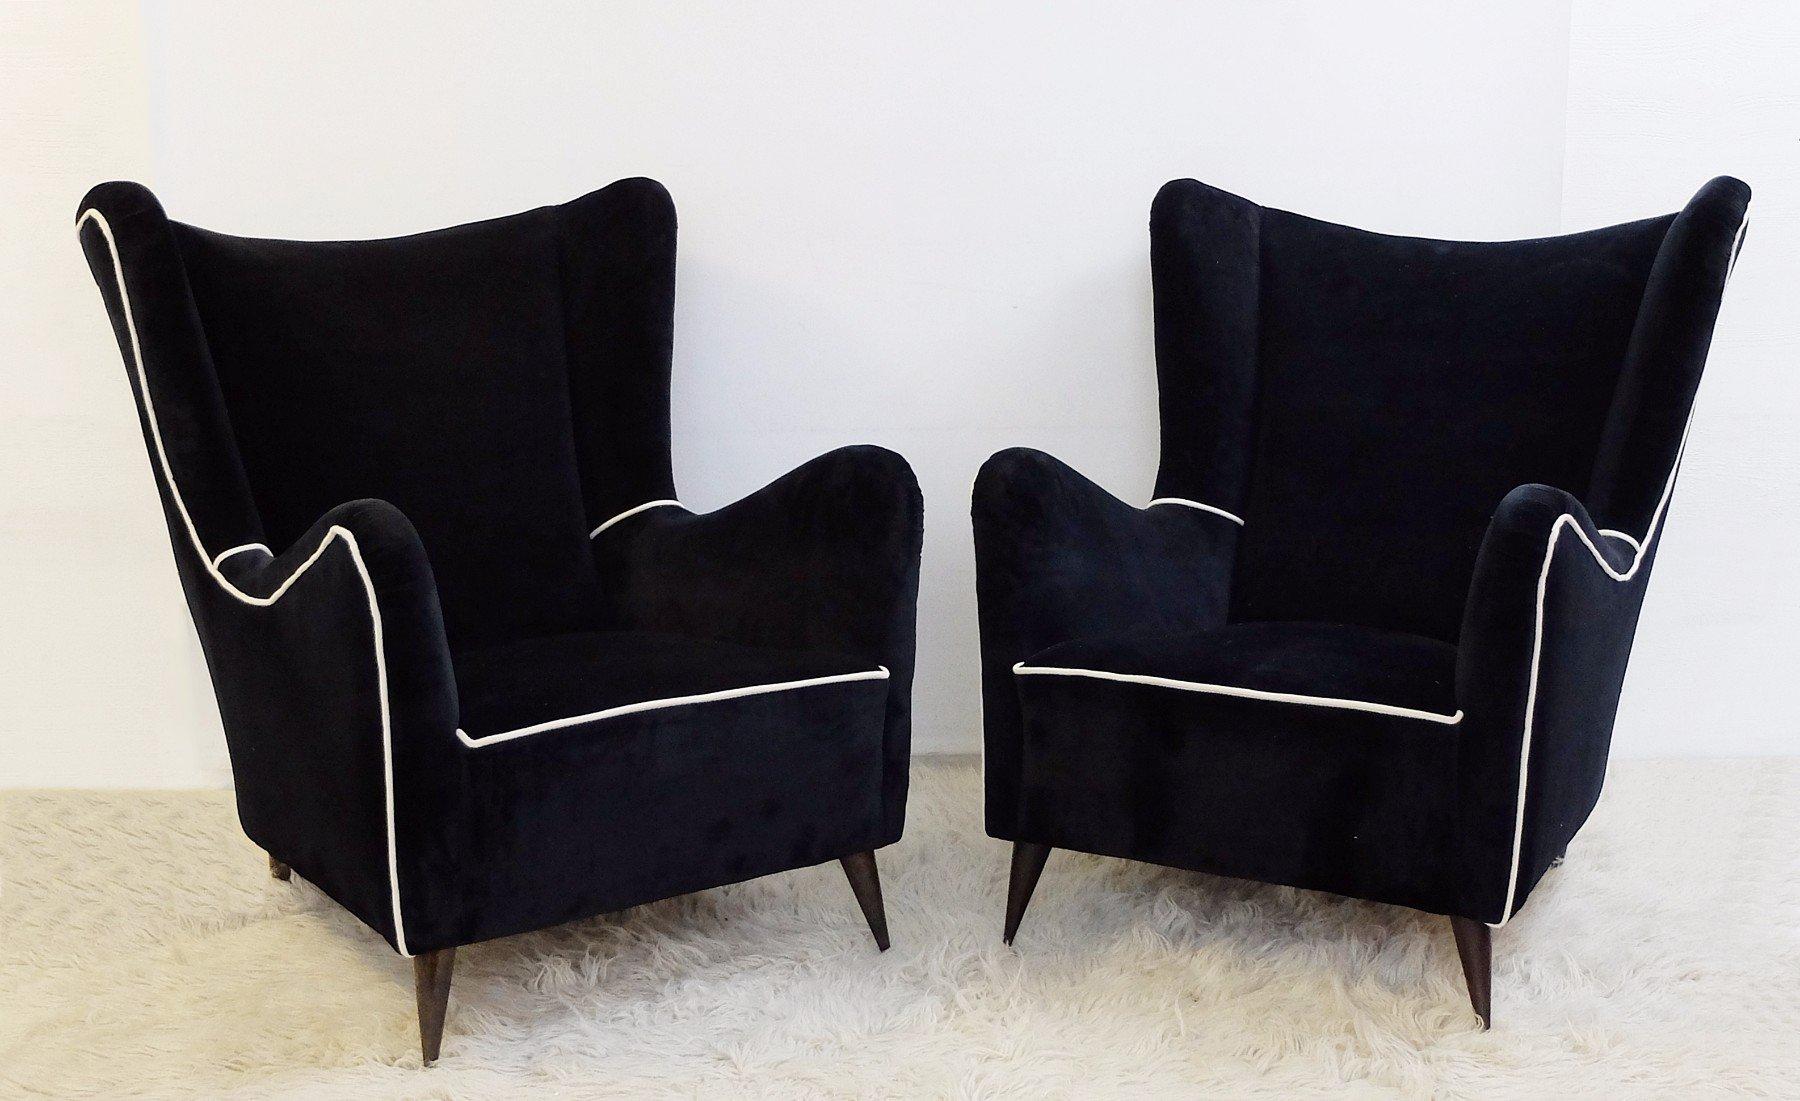 italienische vintage sessel in schwarz wei 2er set bei. Black Bedroom Furniture Sets. Home Design Ideas